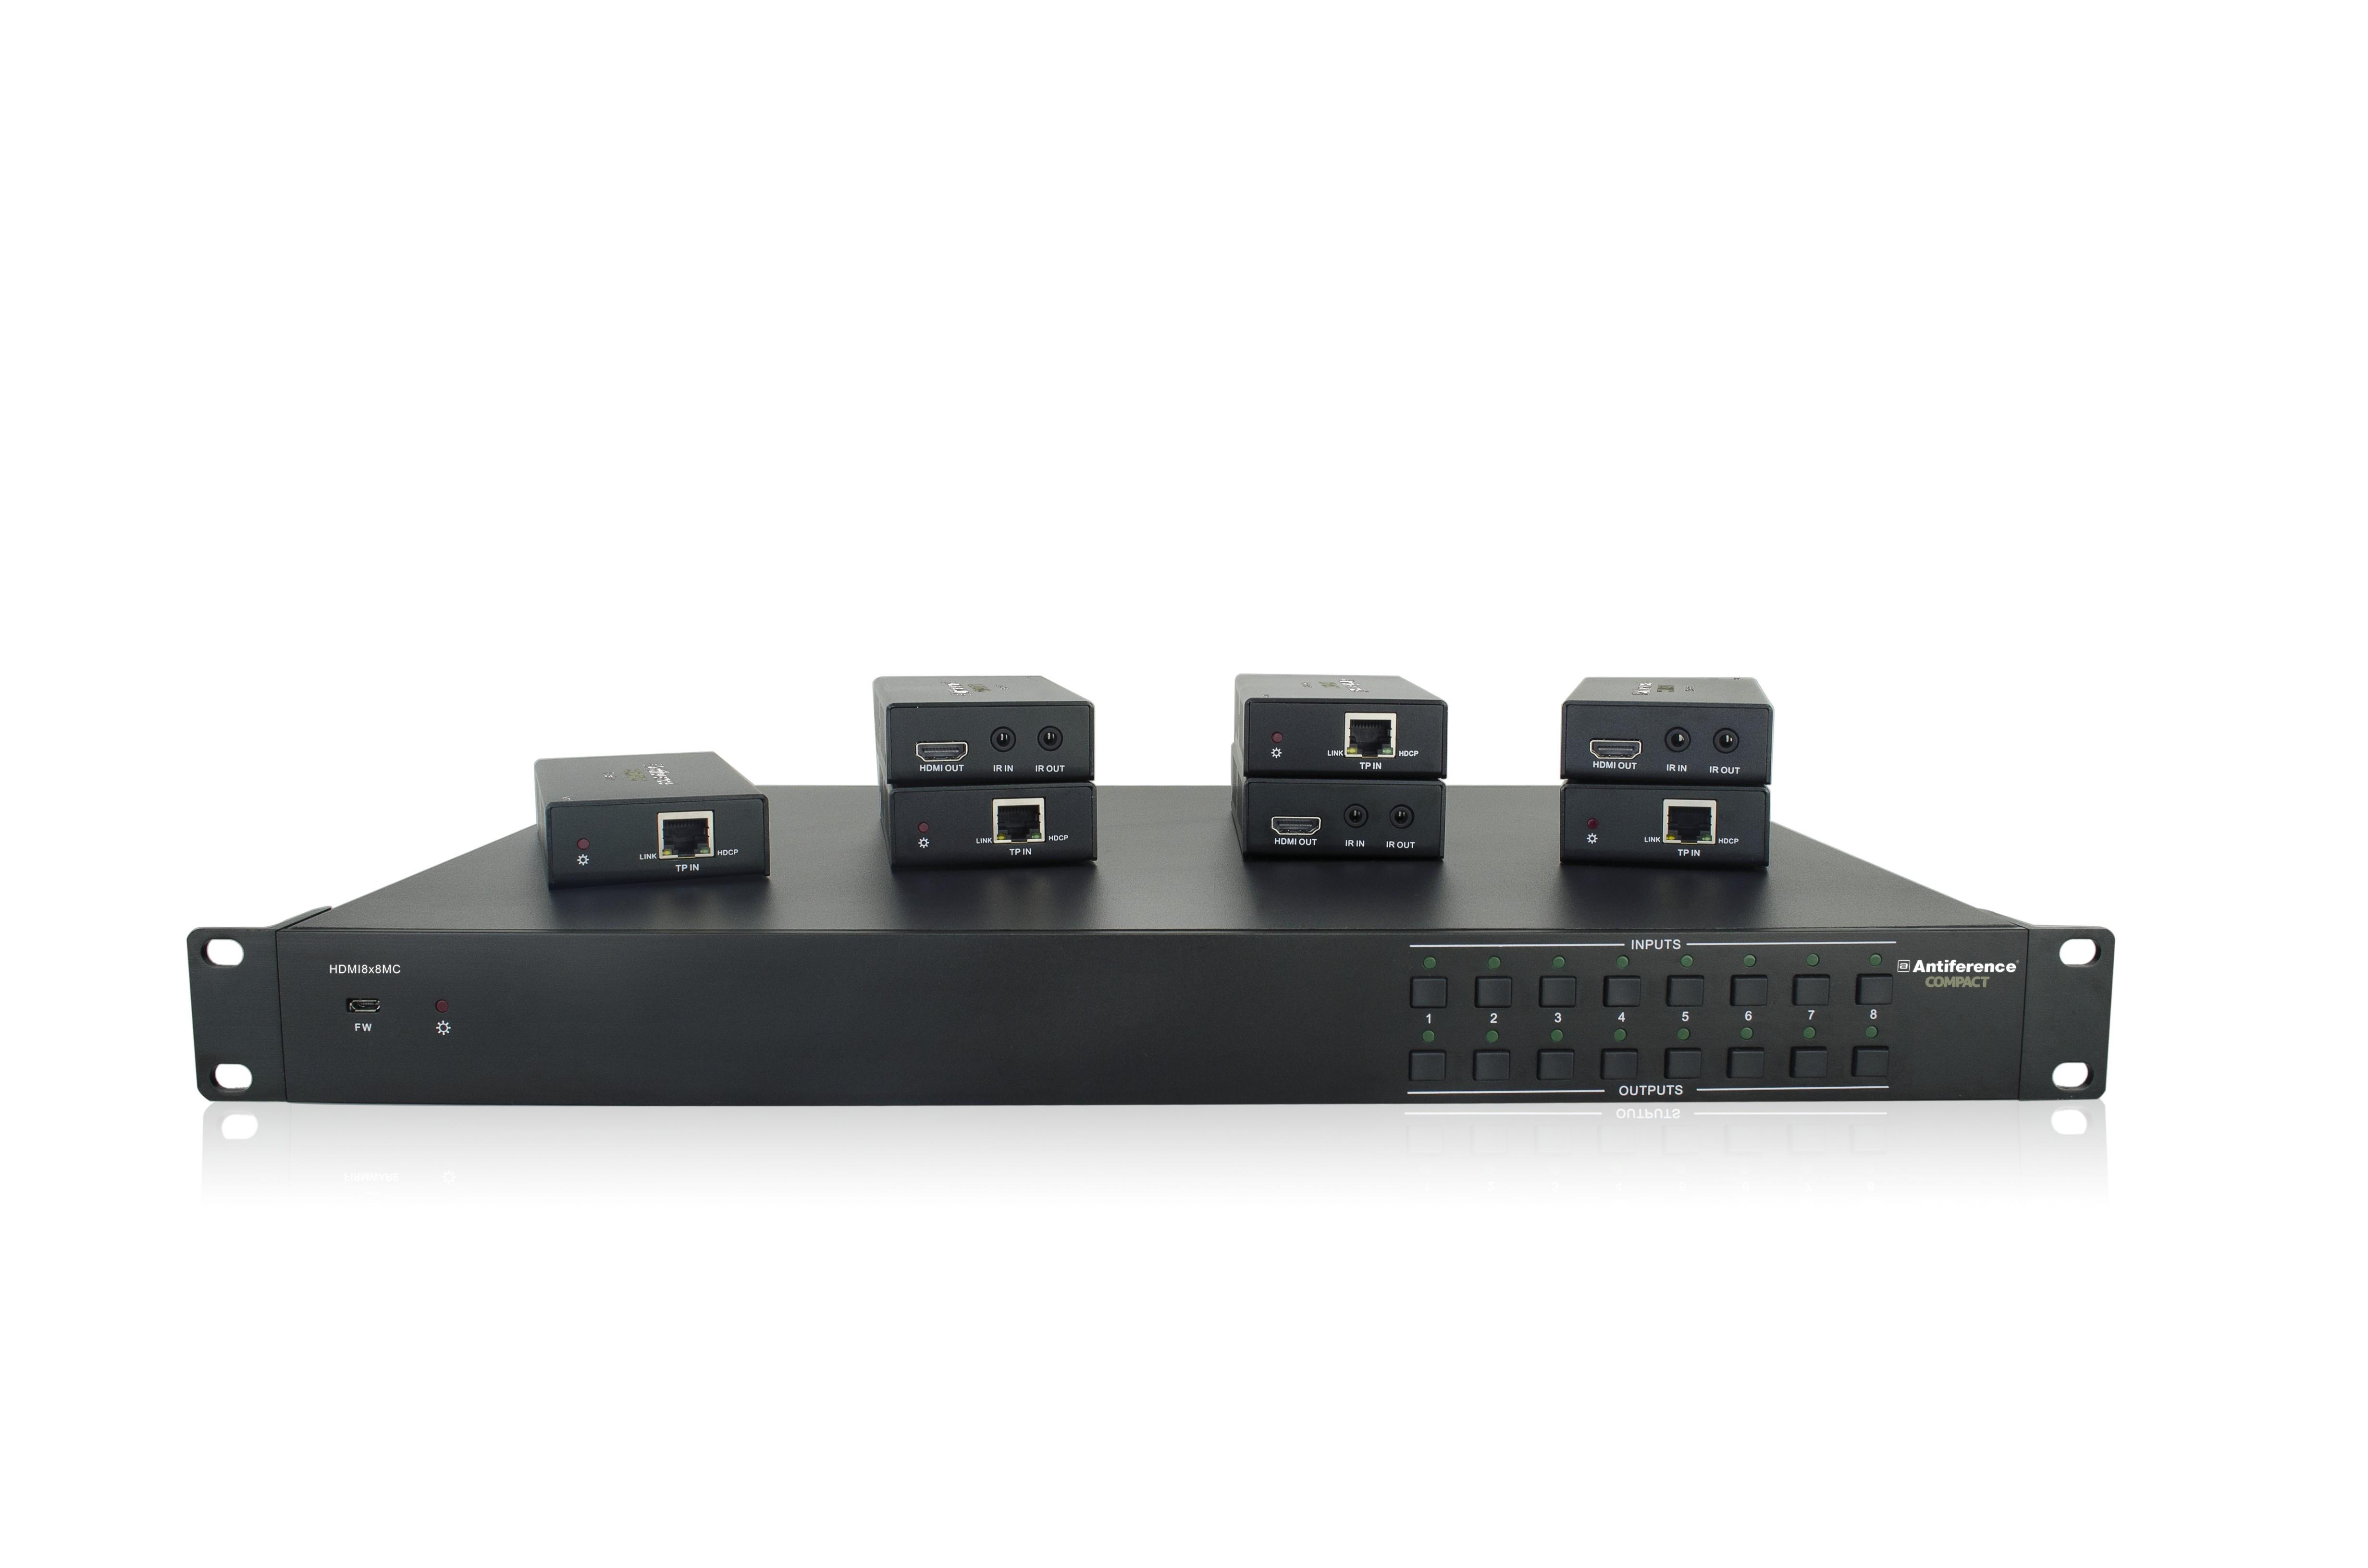 HDMI8X8MC Front Panel Image